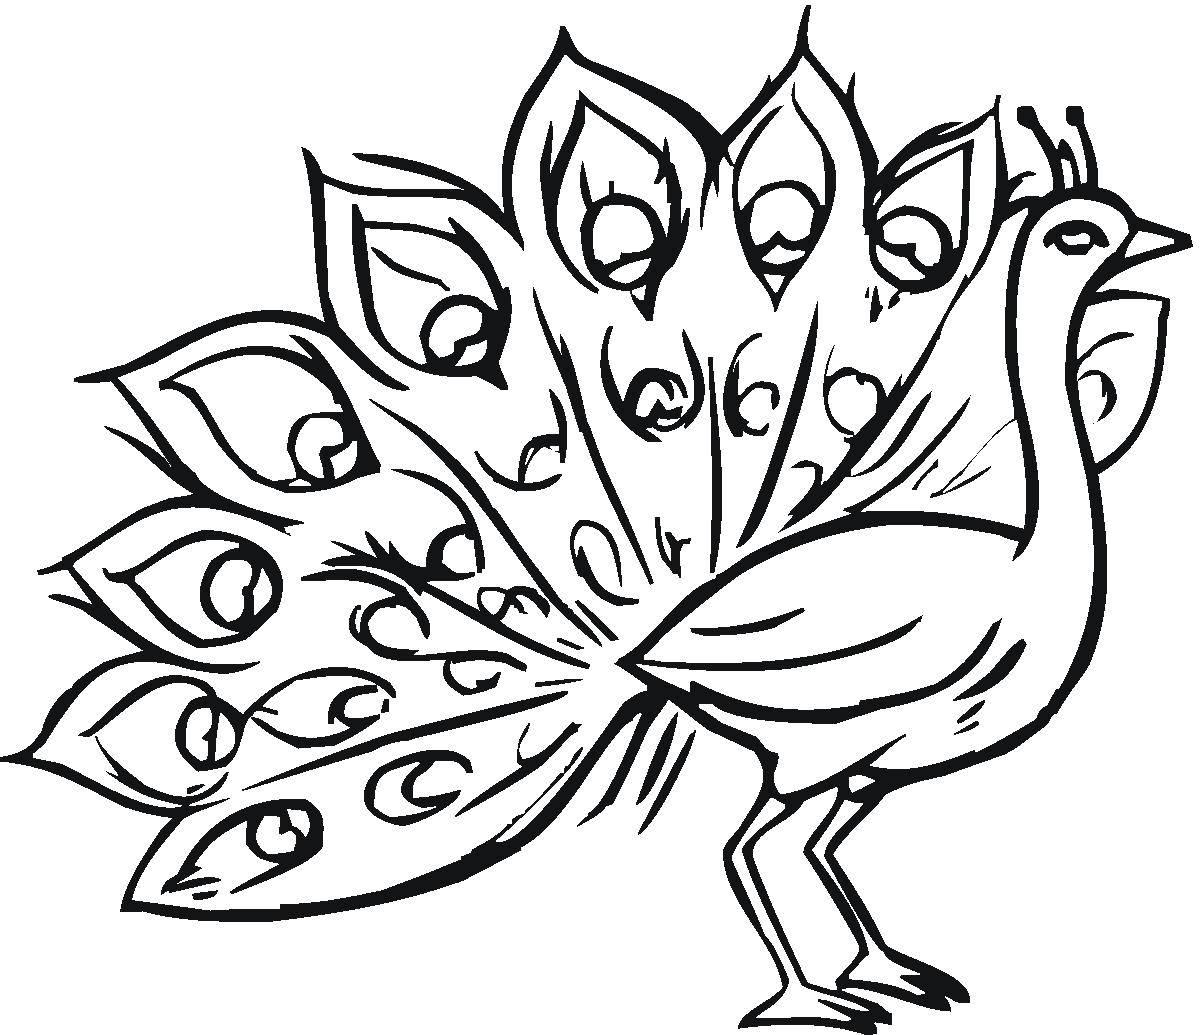 жар-птица без хвоста картинки раскраски ресторан позиционирует себя